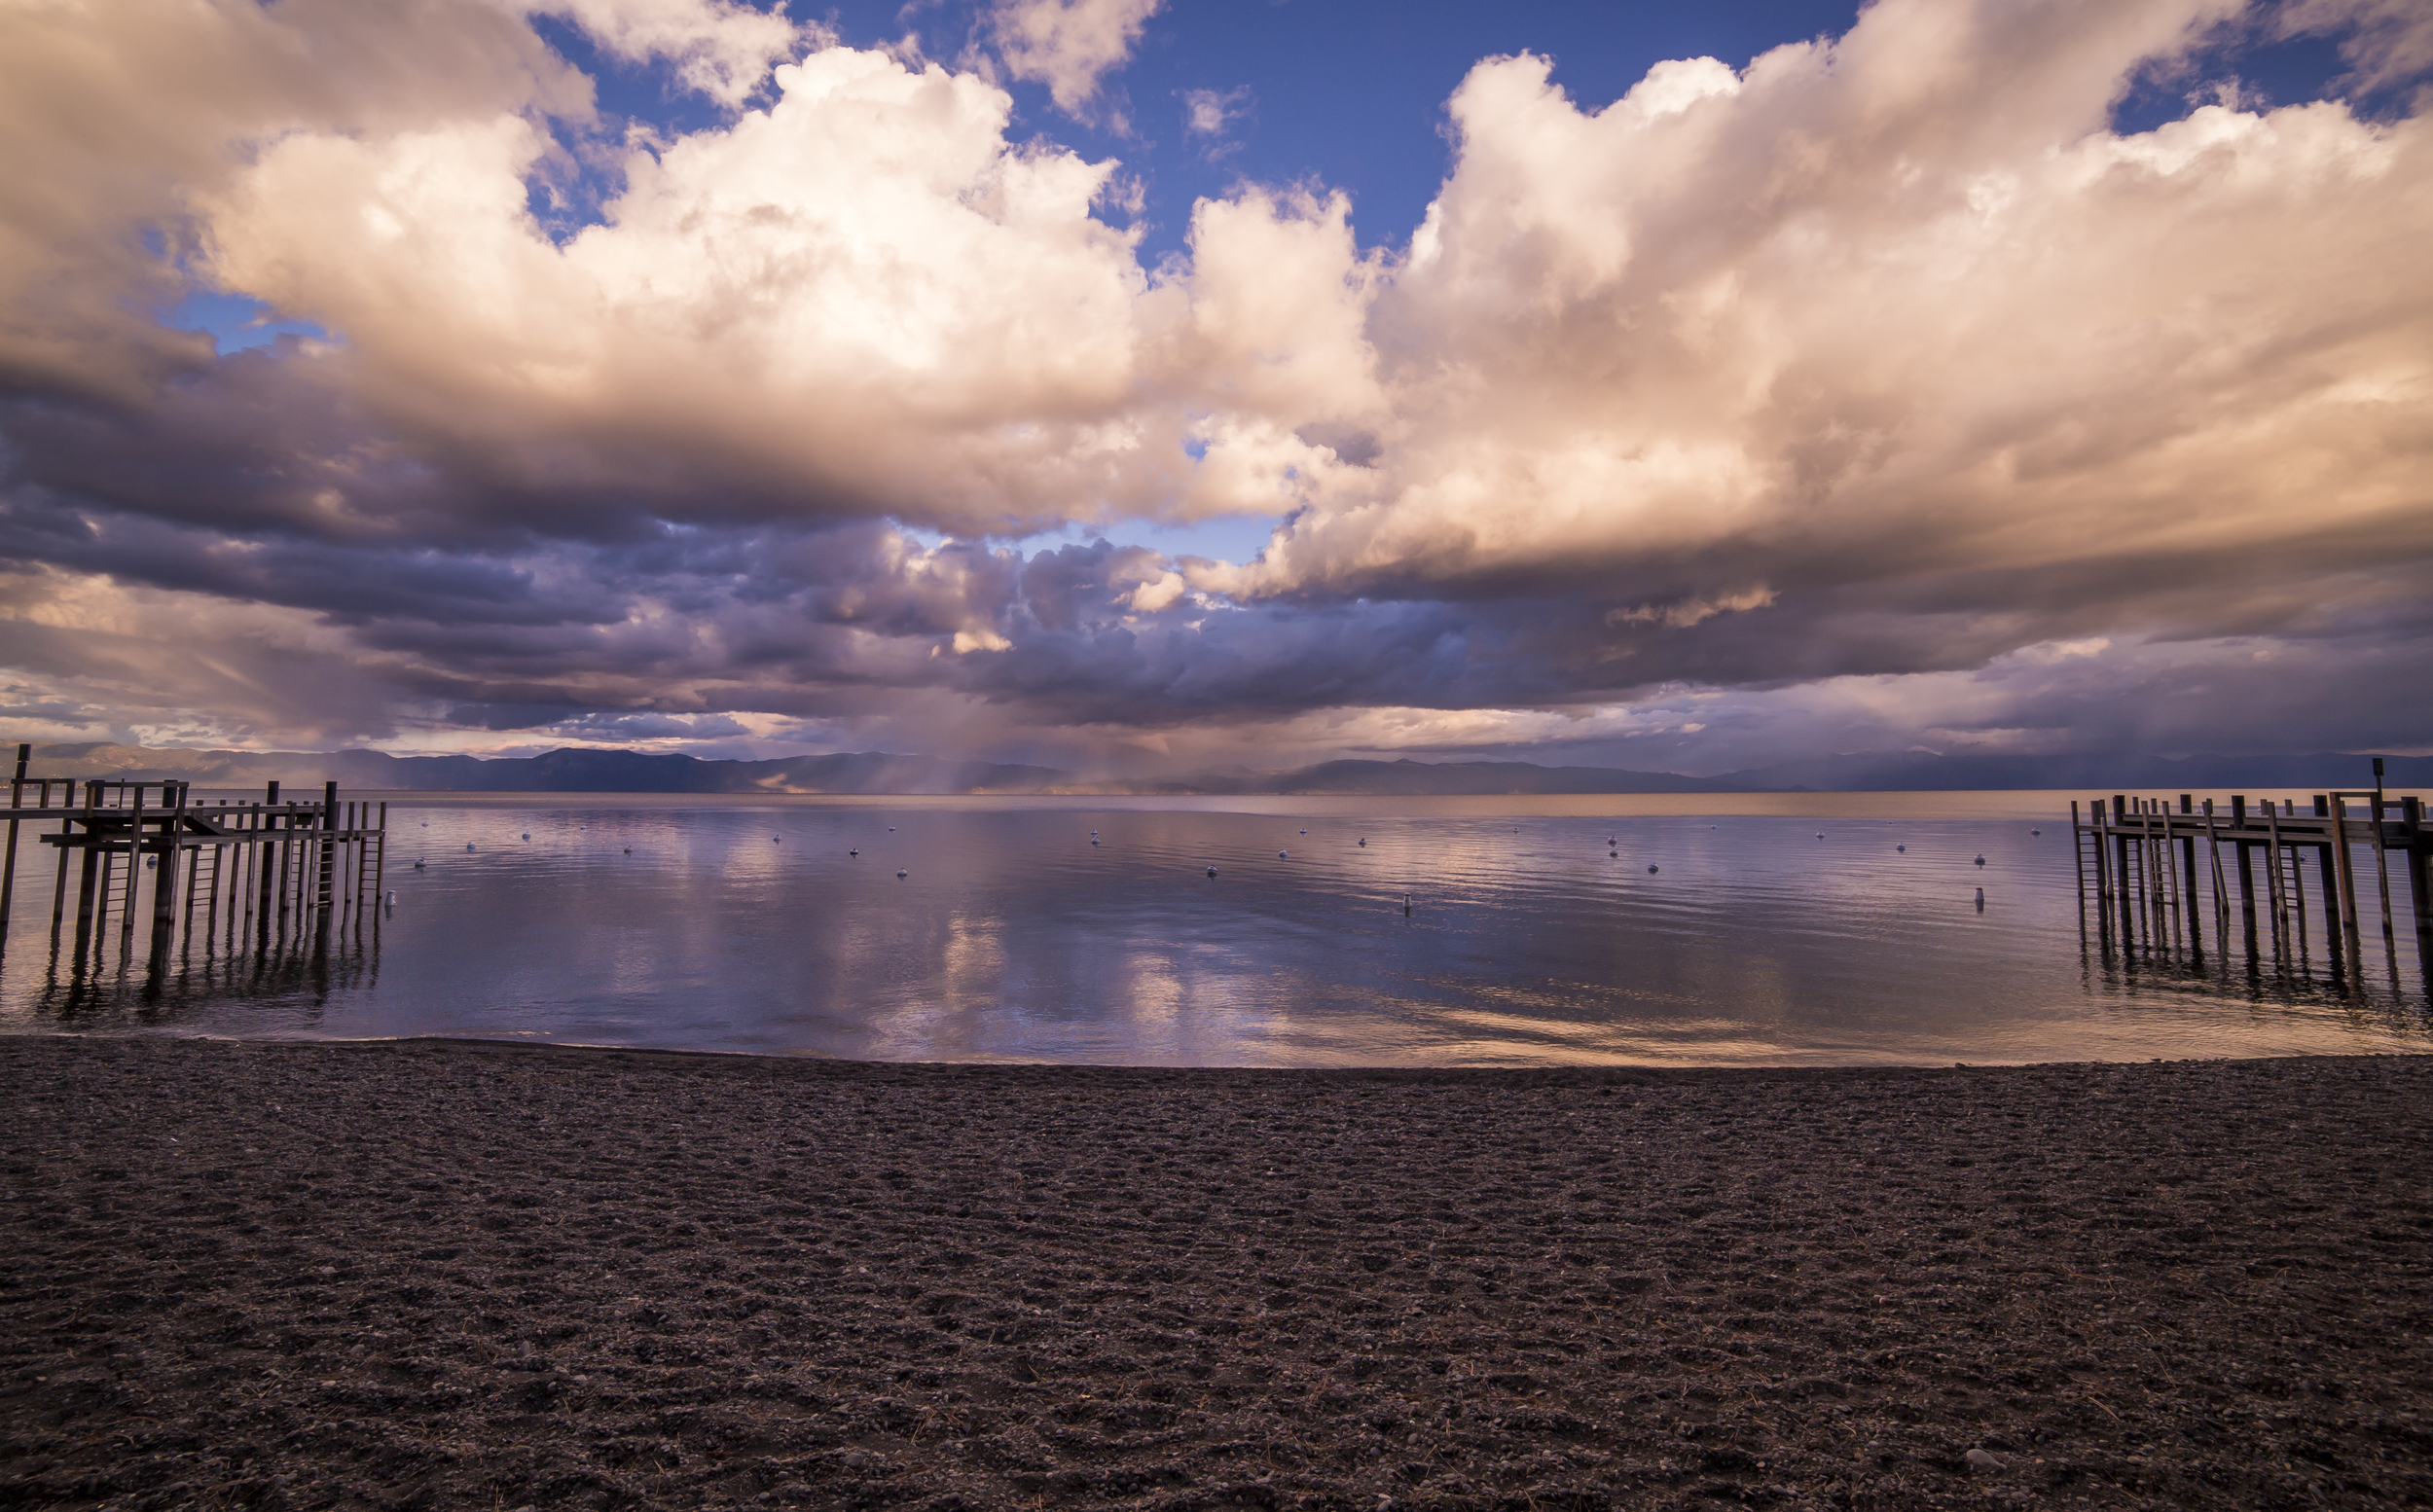 Beach Access at Lake Tahoe via The Cottage Inn